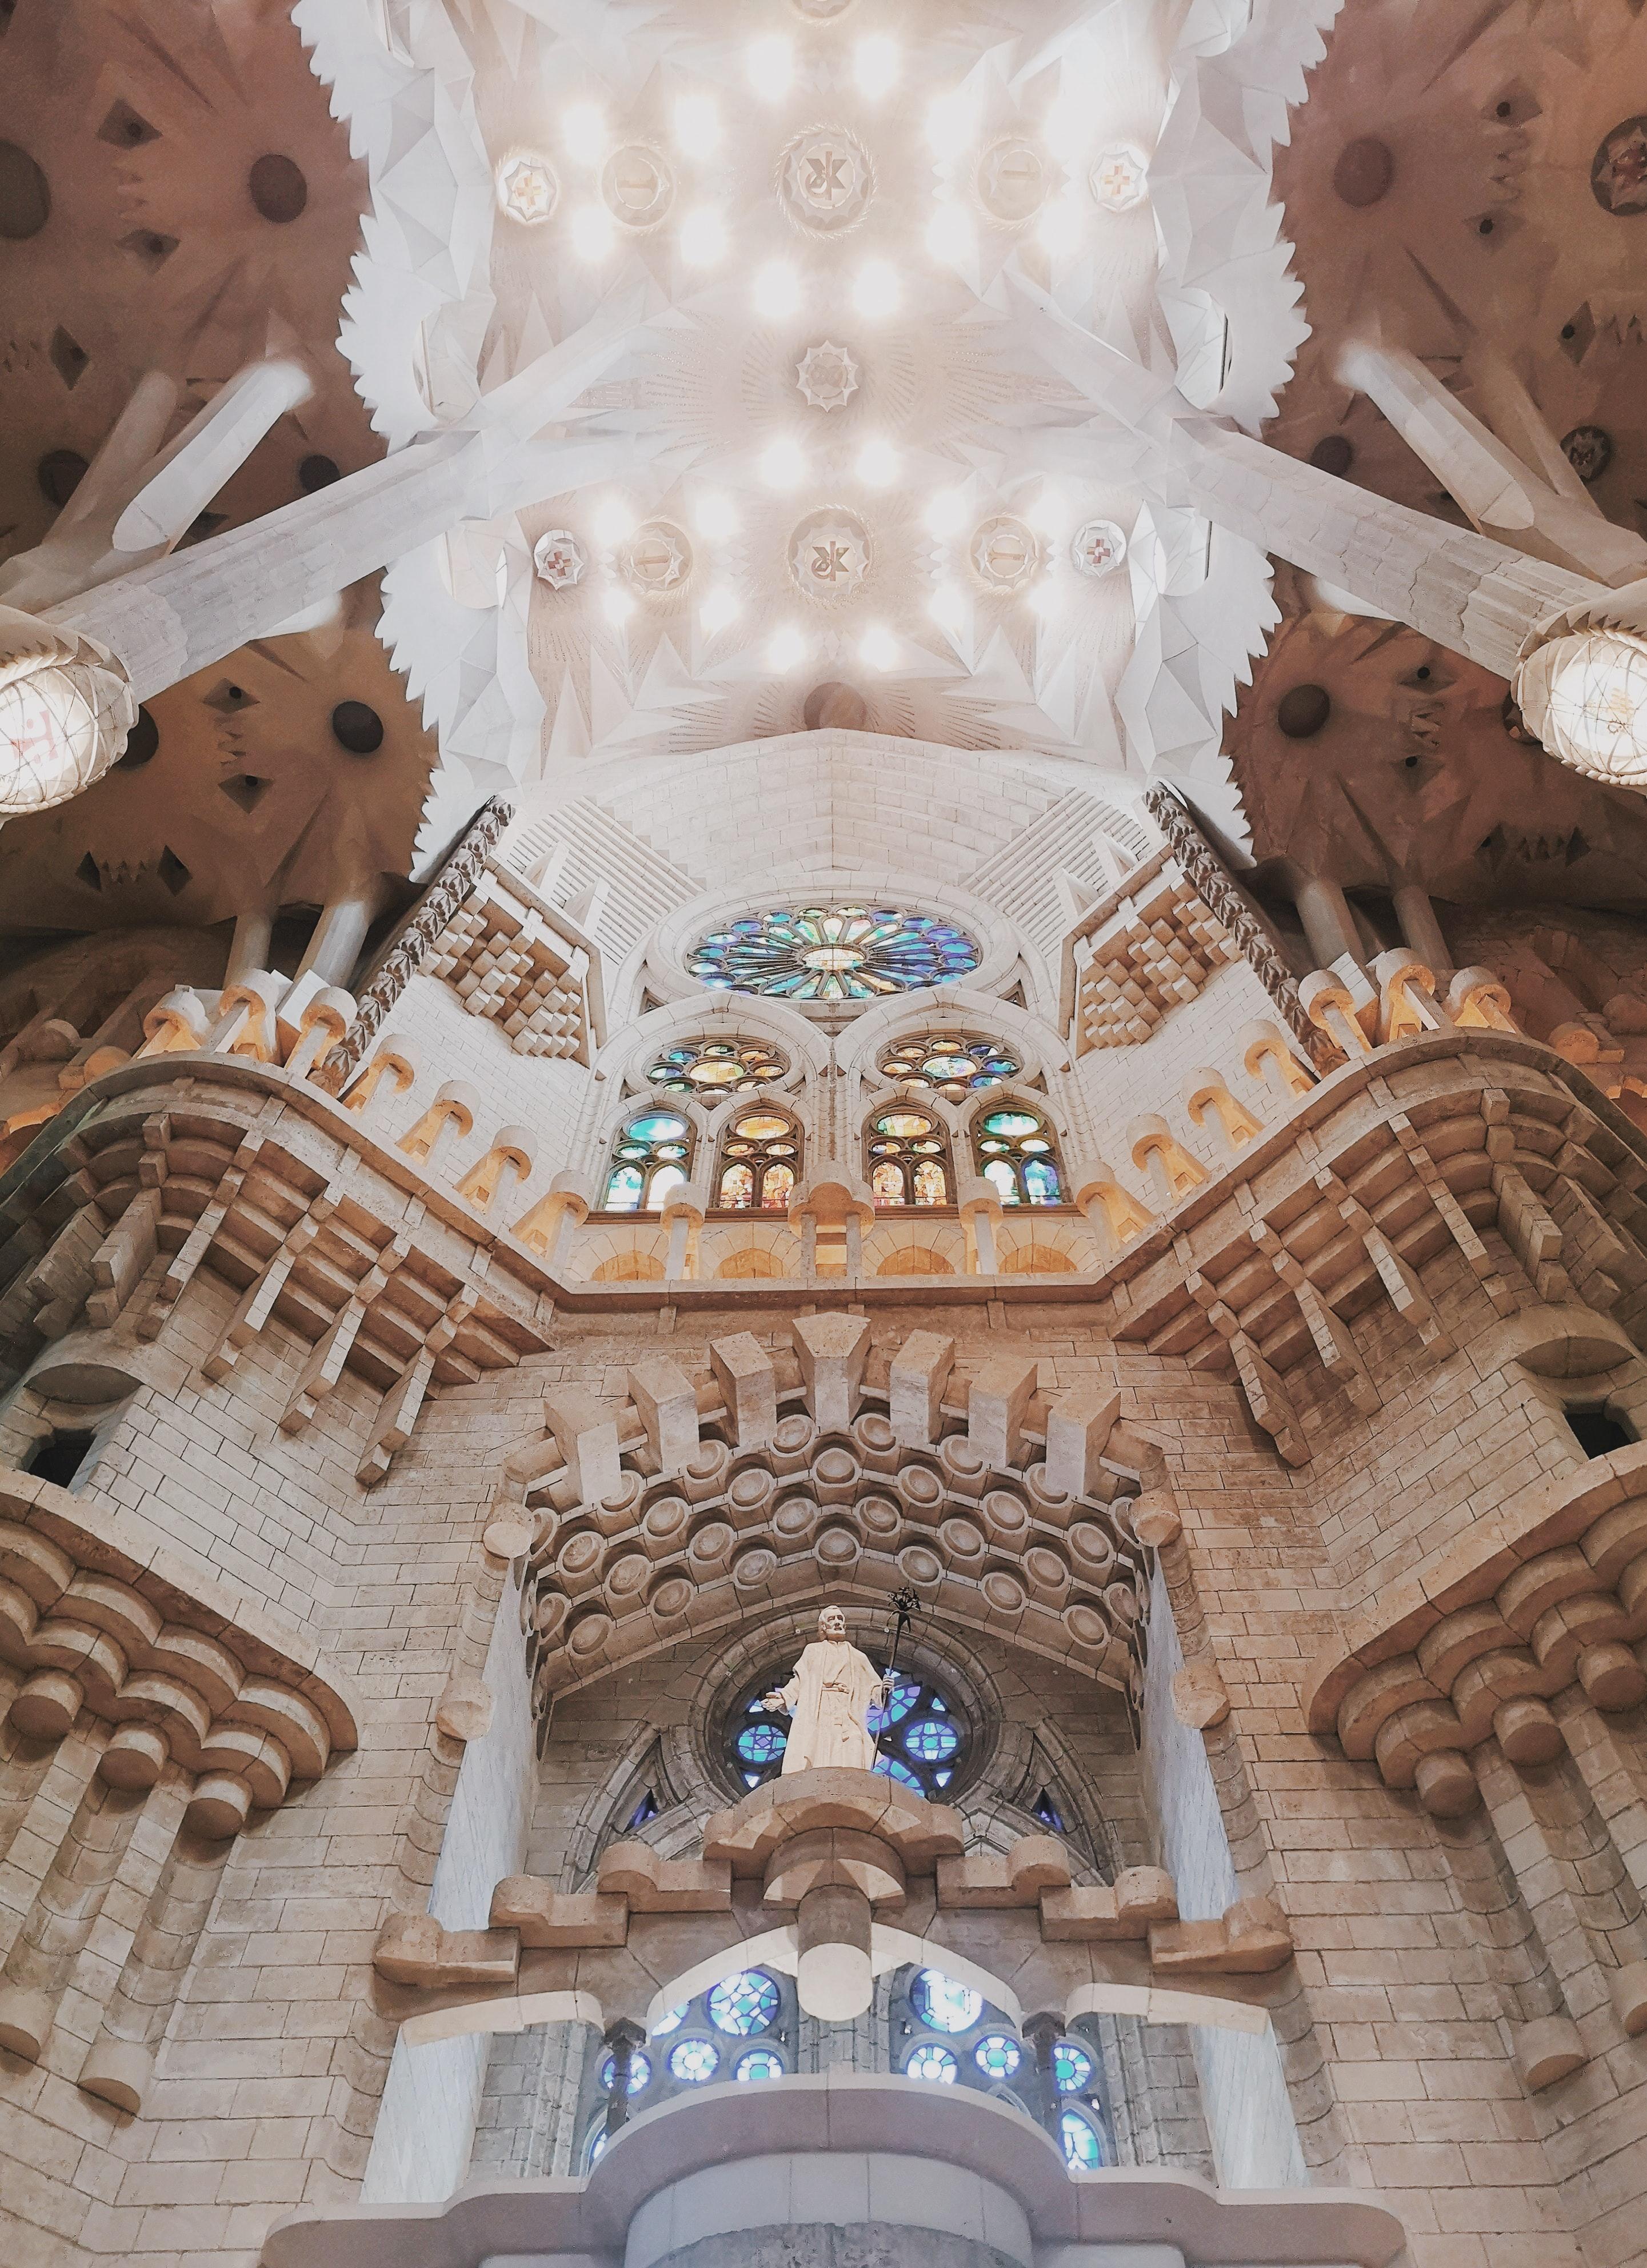 uSpots - Gaudí - La Sagrada Familia